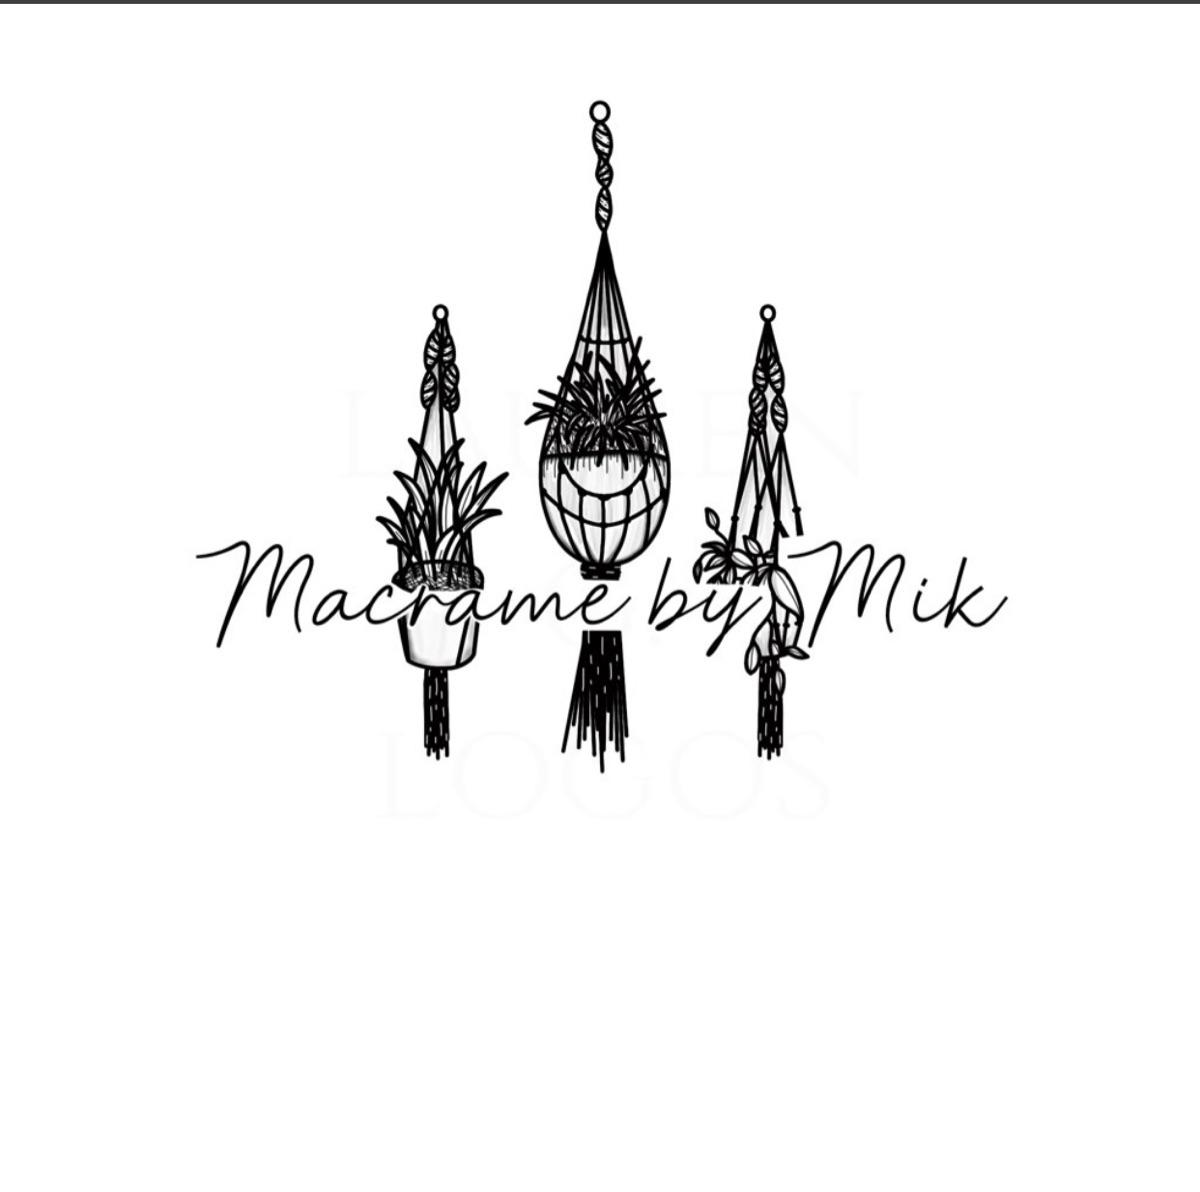 Macramé by Mik (@macramebymik) Cover Image